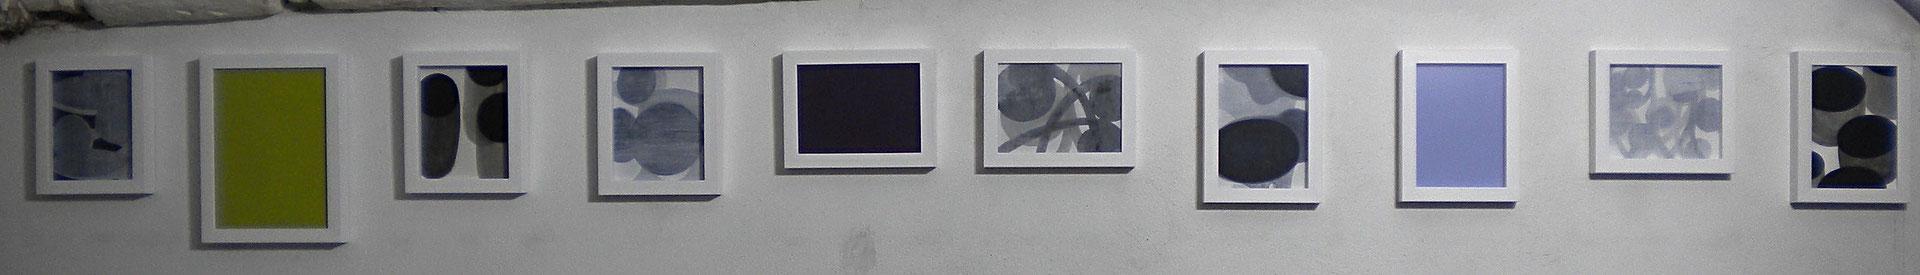 SERIE 12-20 acrilico su carta 2012 misure varie, lunghezza totale cm300